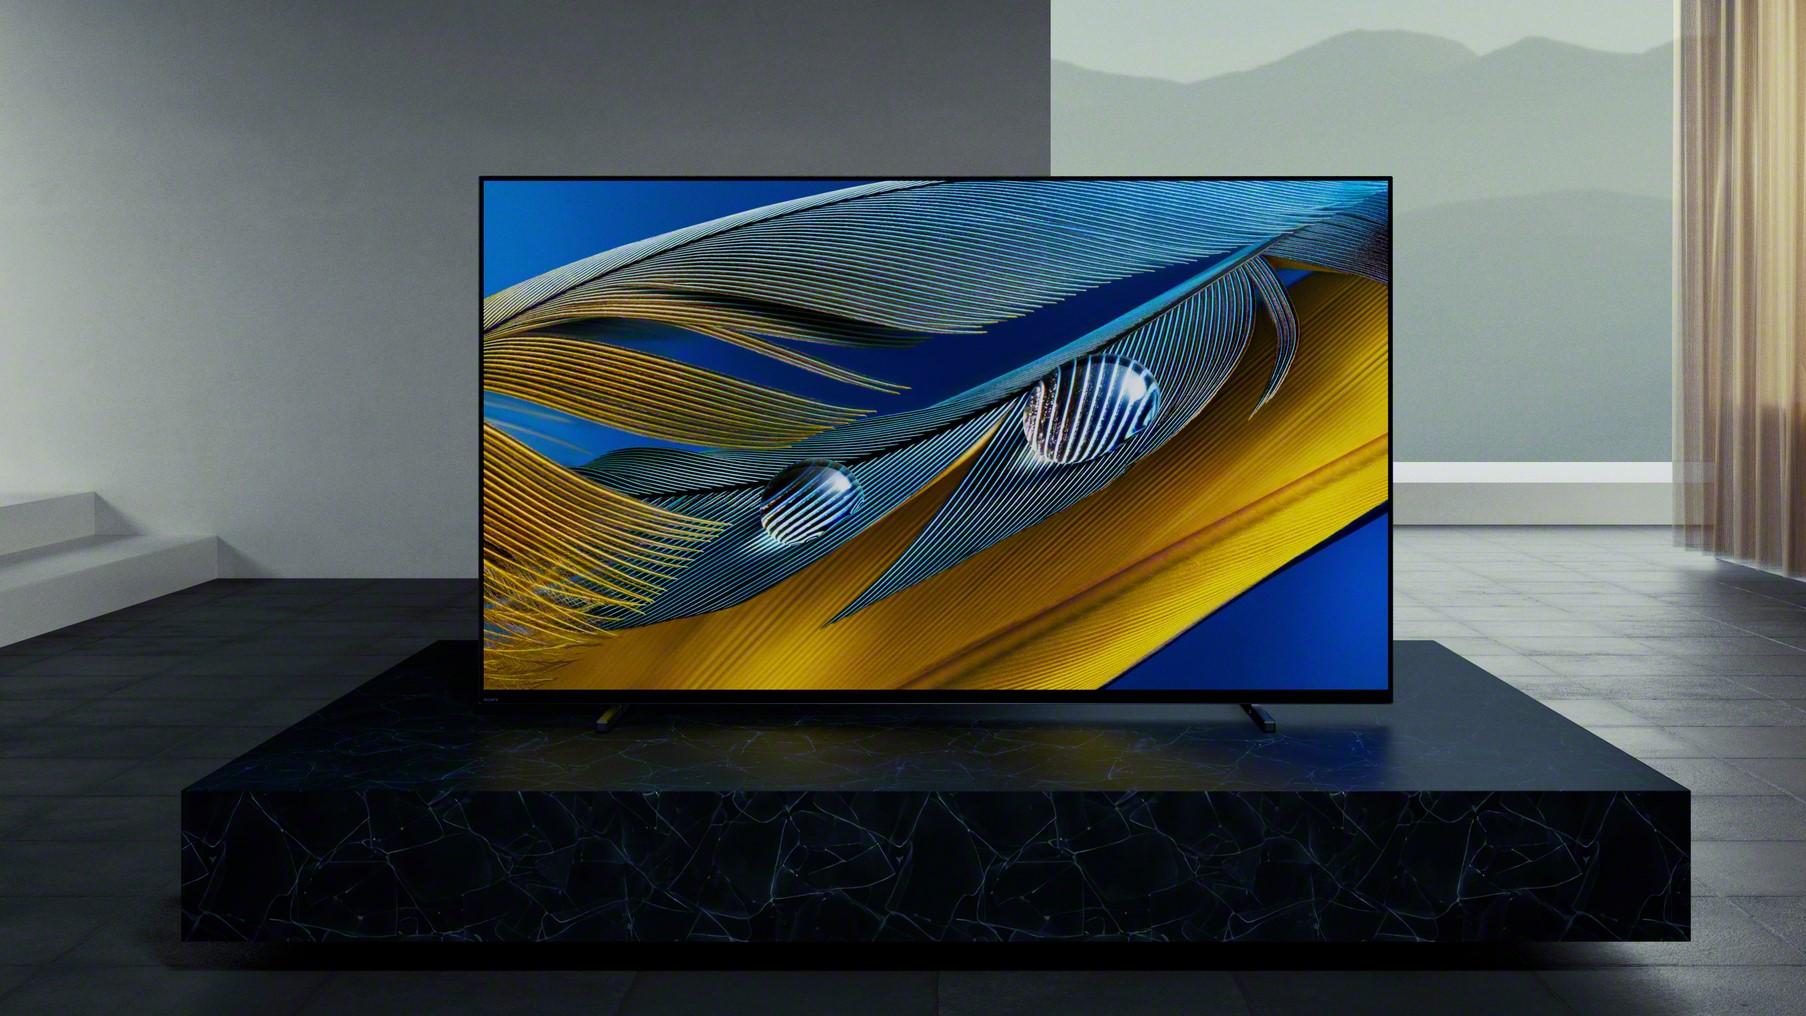 Sony XR-65A80J OLED Ultra HDTV